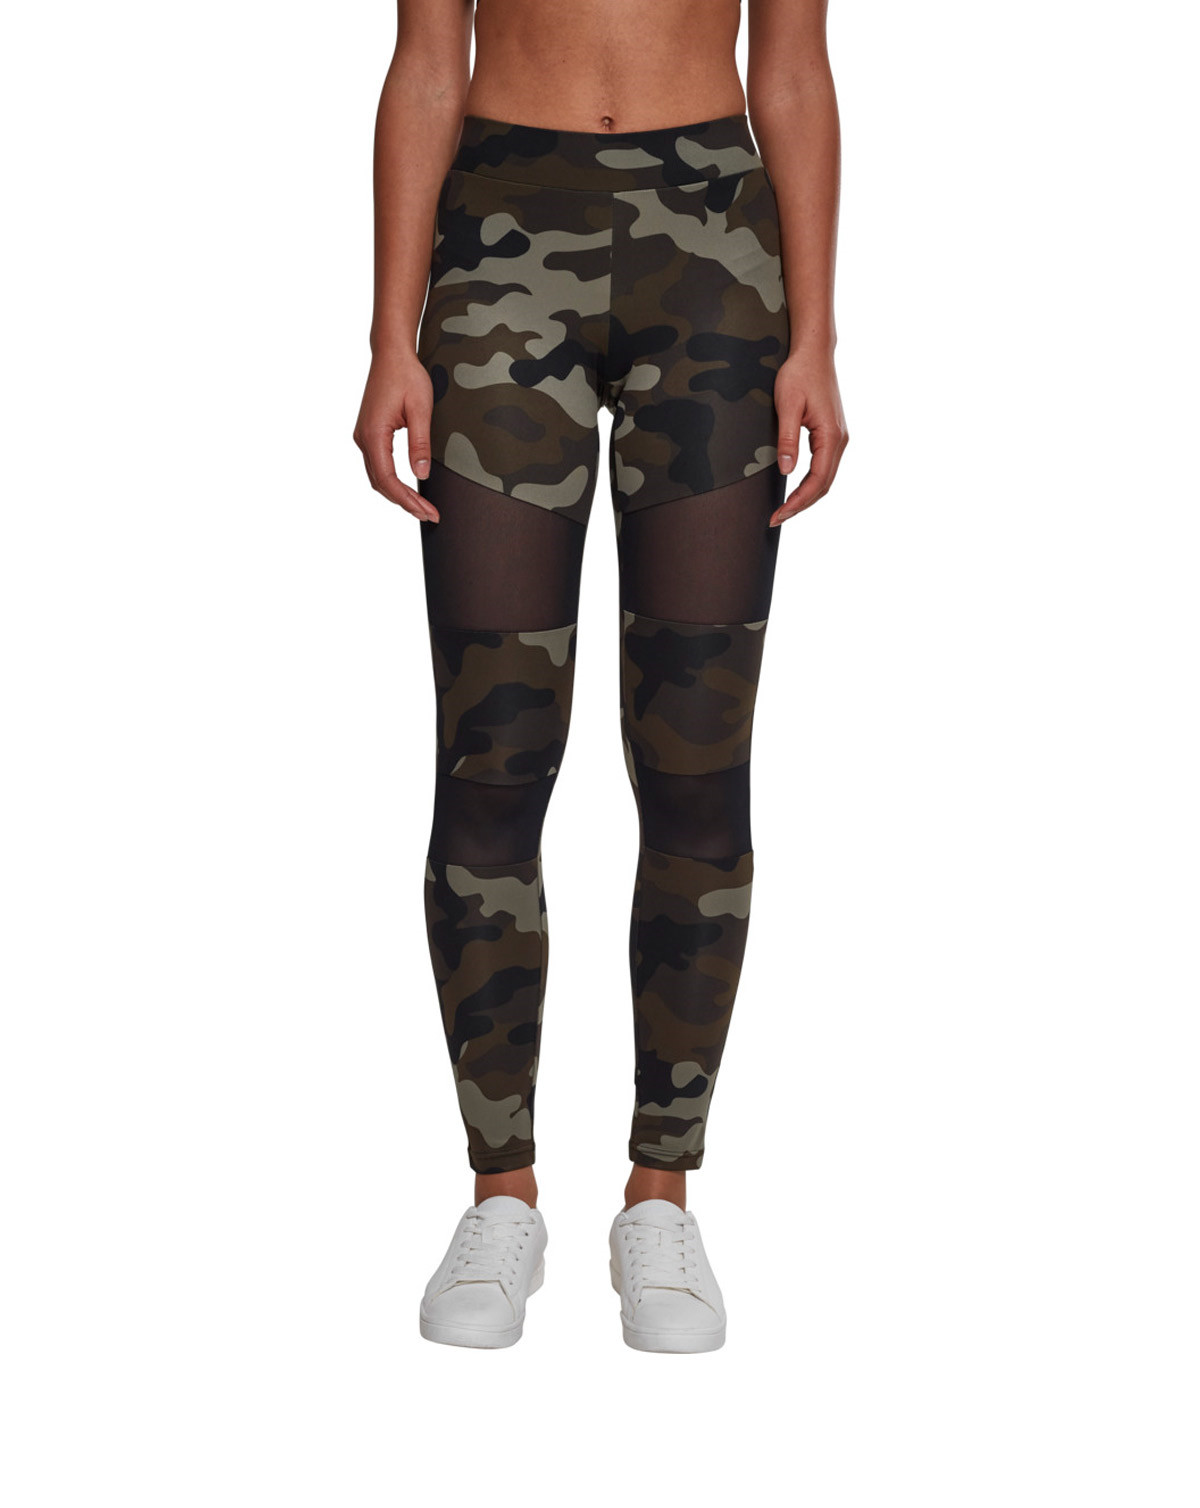 Image of   Urban Classics Camouflage Leggings m. Mesh (Woodland, 2XL)